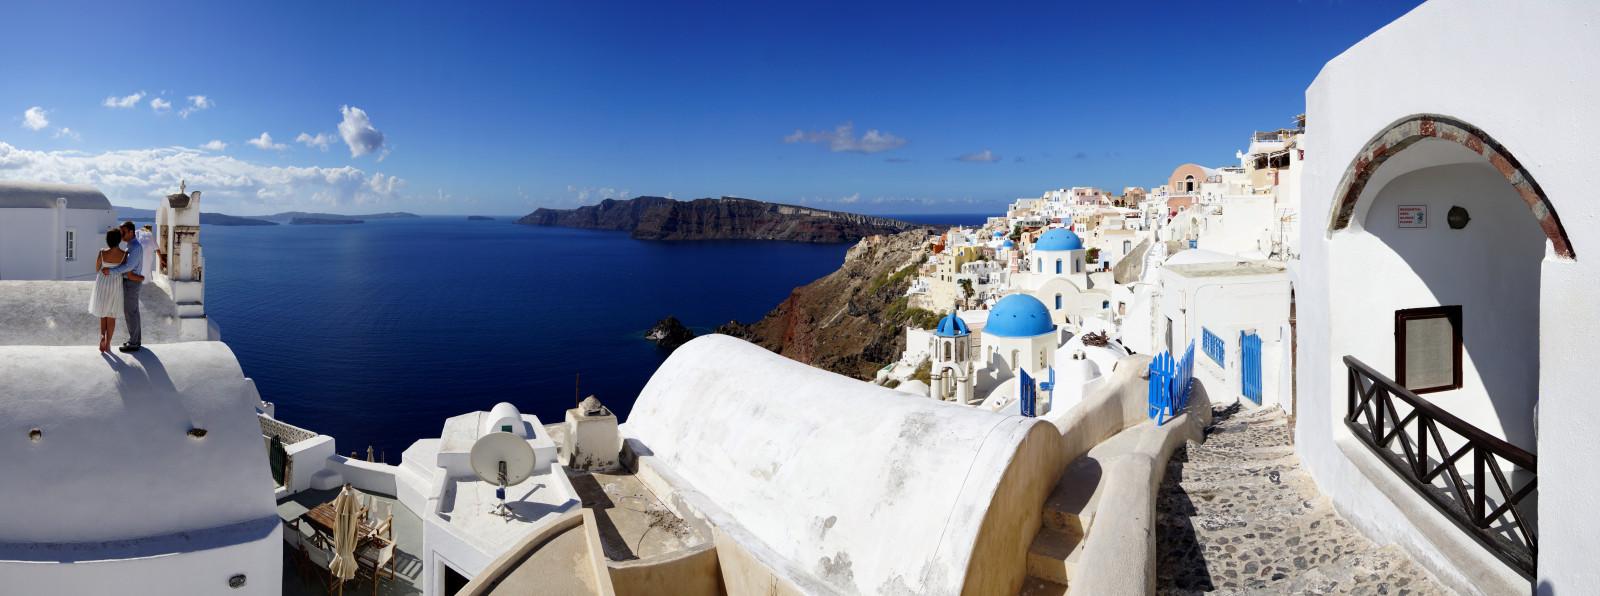 travel sea wallpaper panorama - photo #8